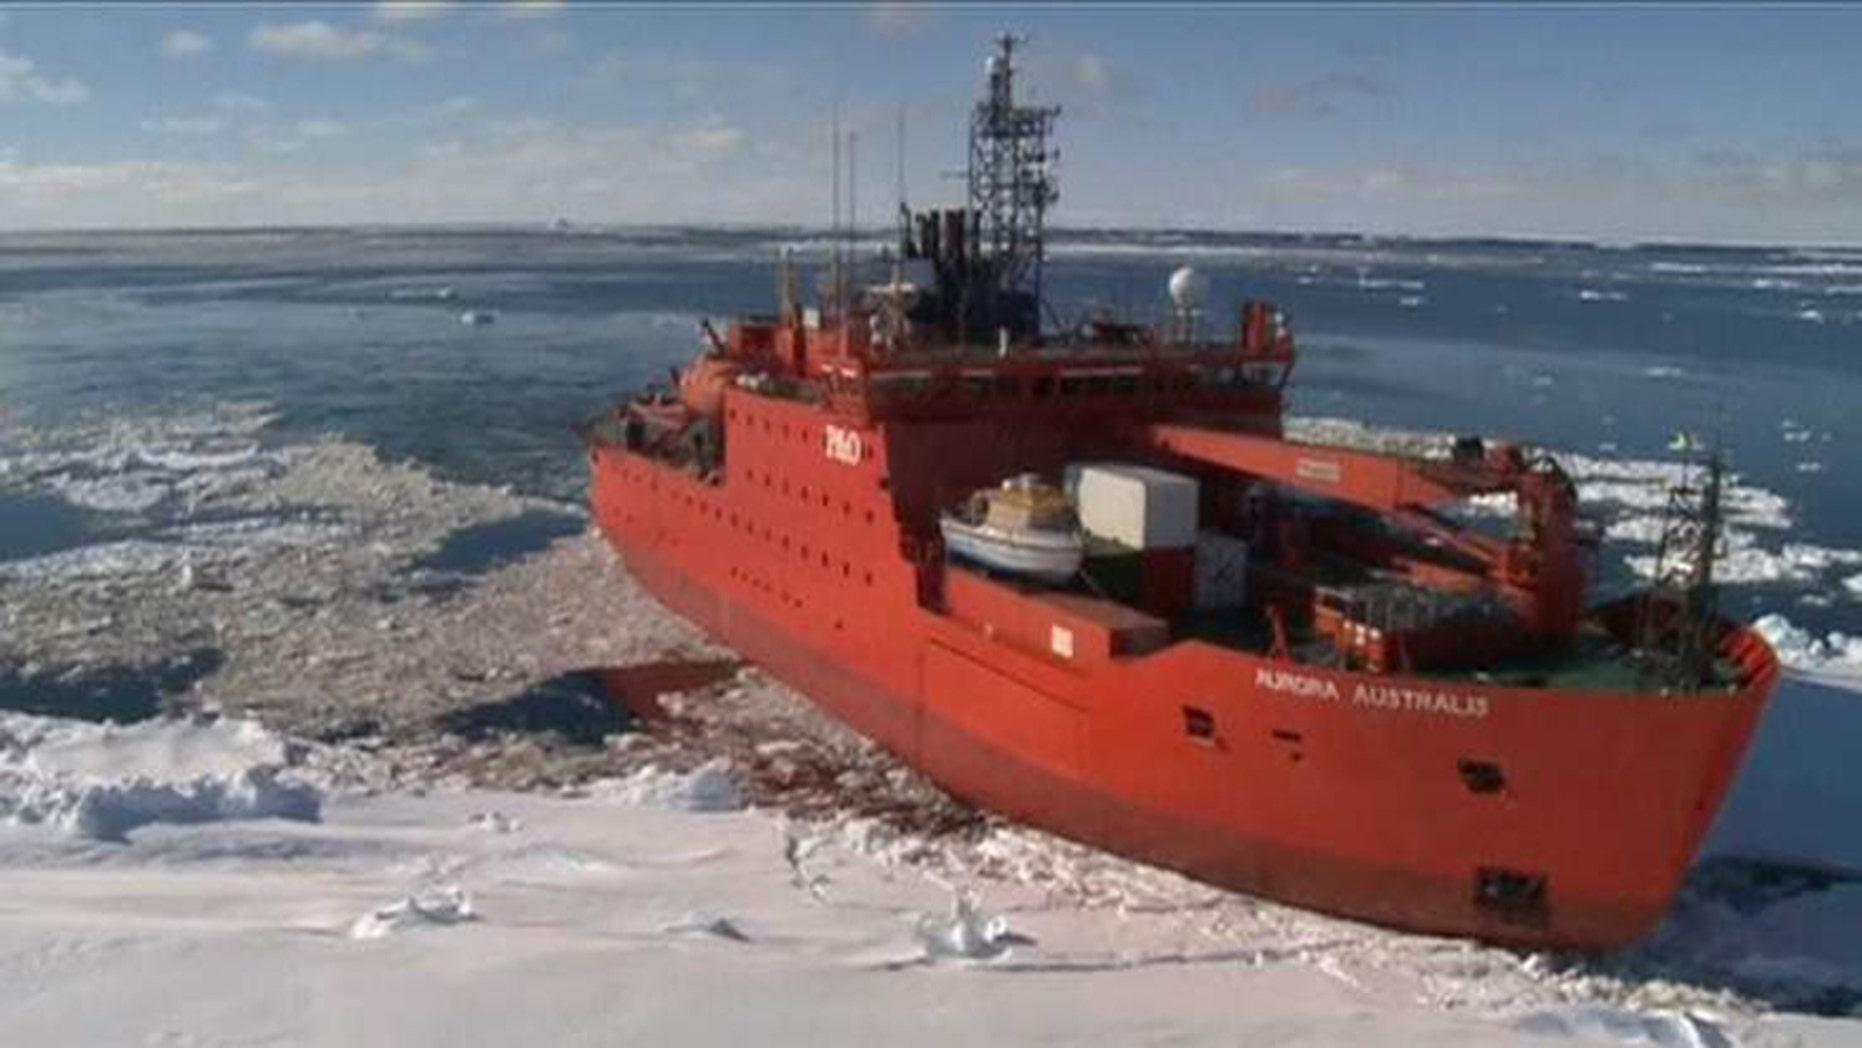 The Aurora Australis icebreaker ship.